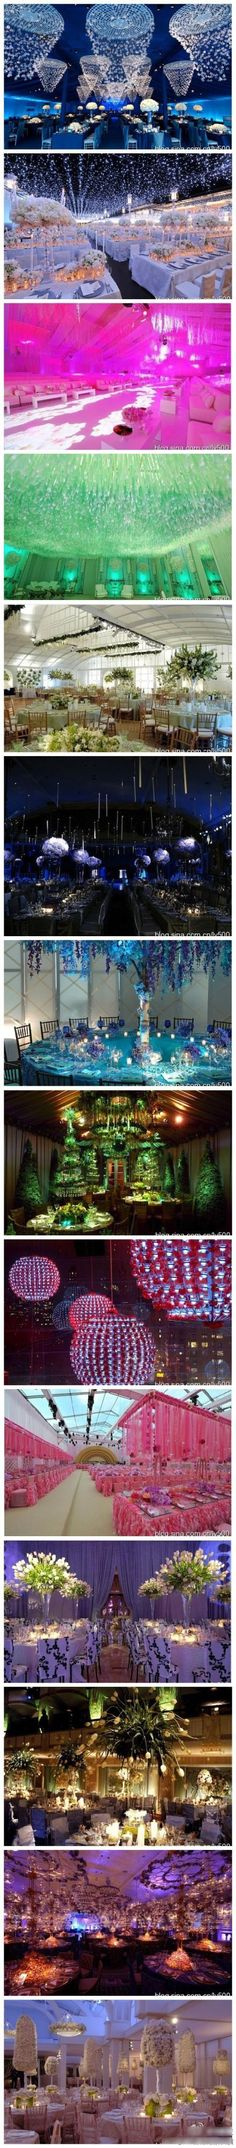 party hall decor, gorgeous! http://www.findbestvenue.com/Venue/BirthdaySearch.aspx